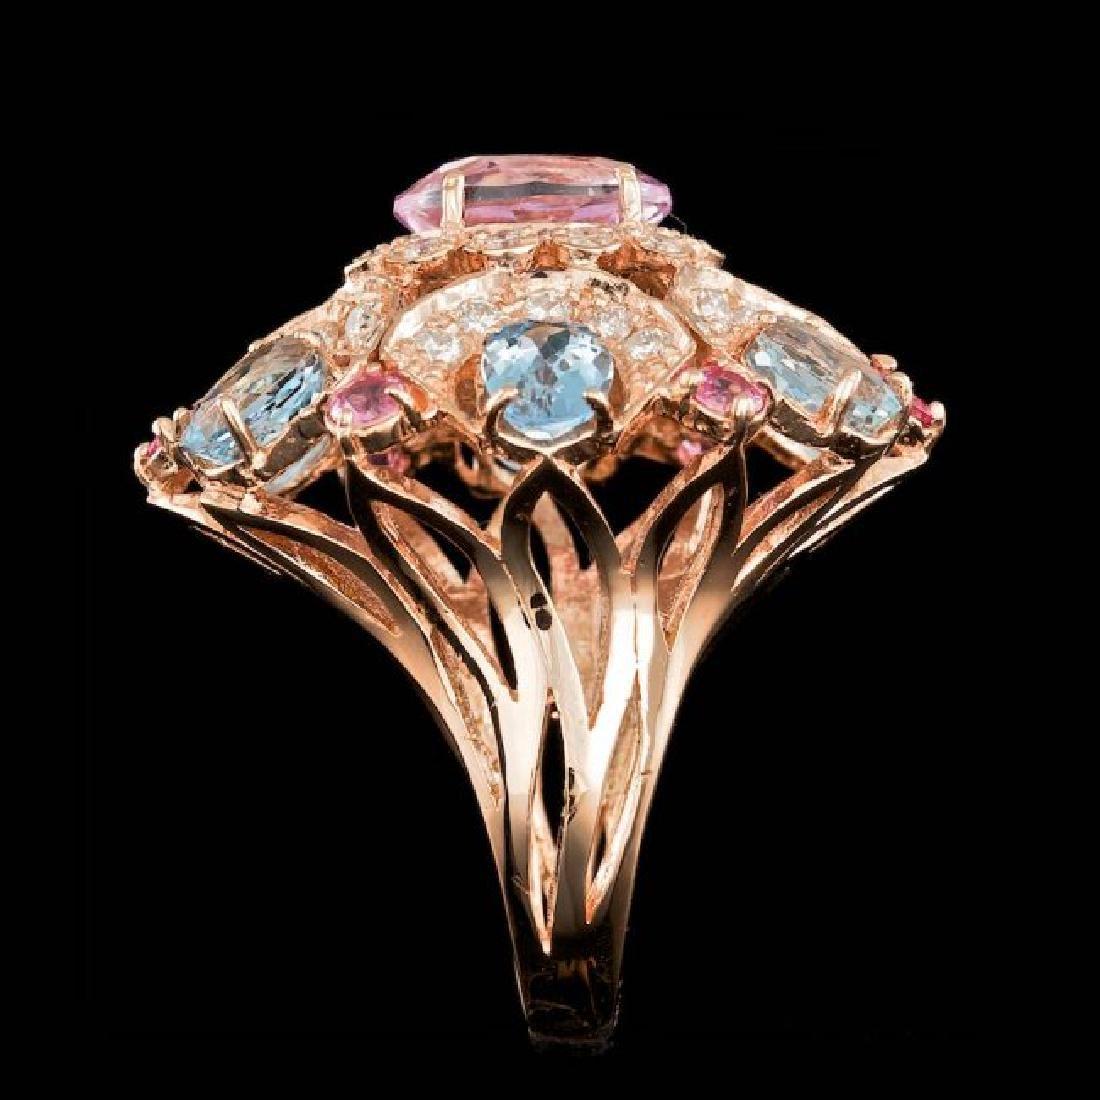 14k Rose Gold 3.50ct Kunzite 1.25ct Diamond Ring - 3